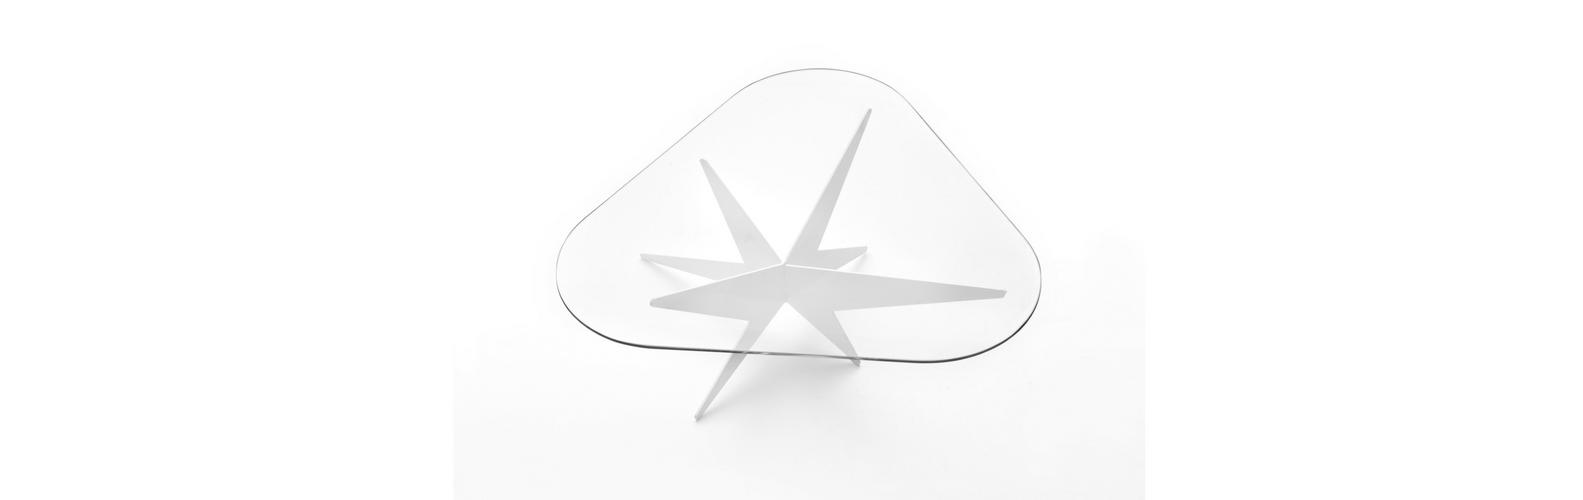 Start - Lamberti Design